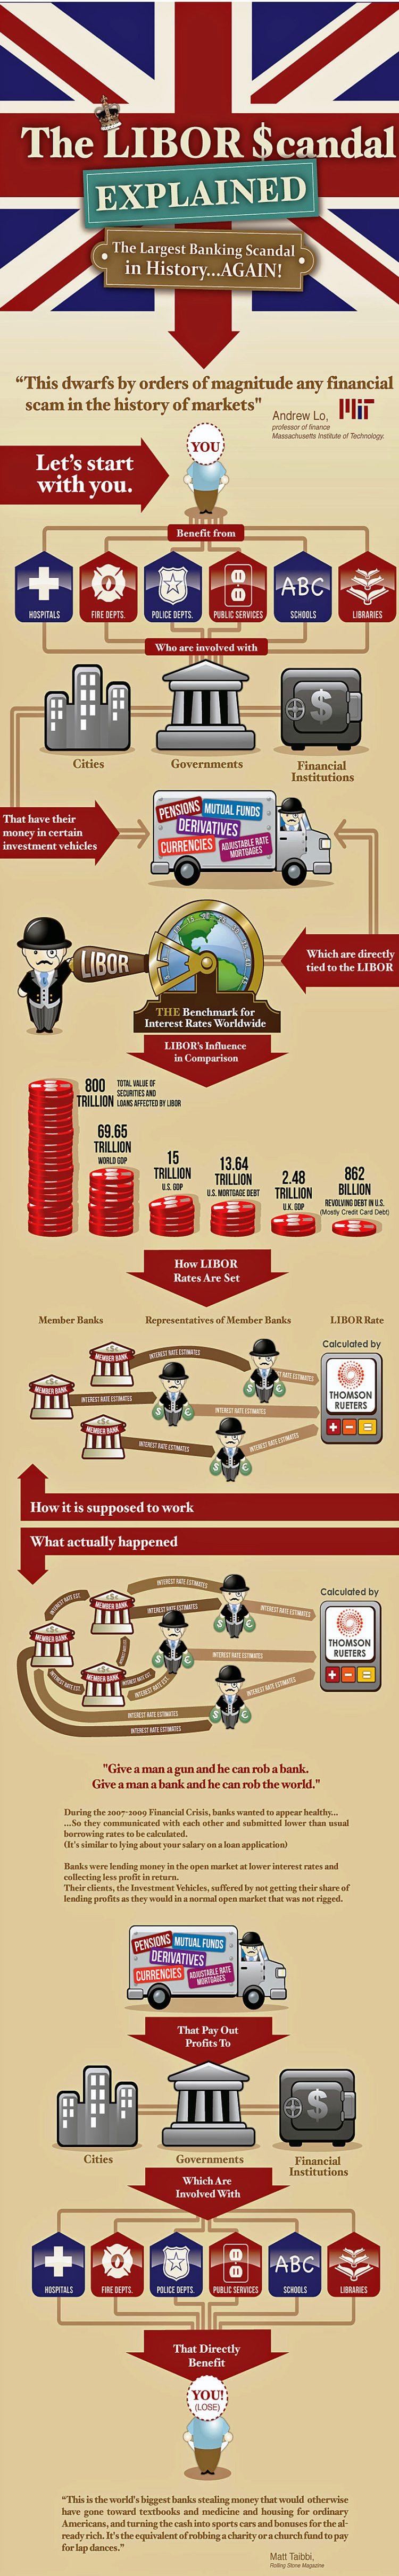 Explaining The LIBOR Scandal Infographic